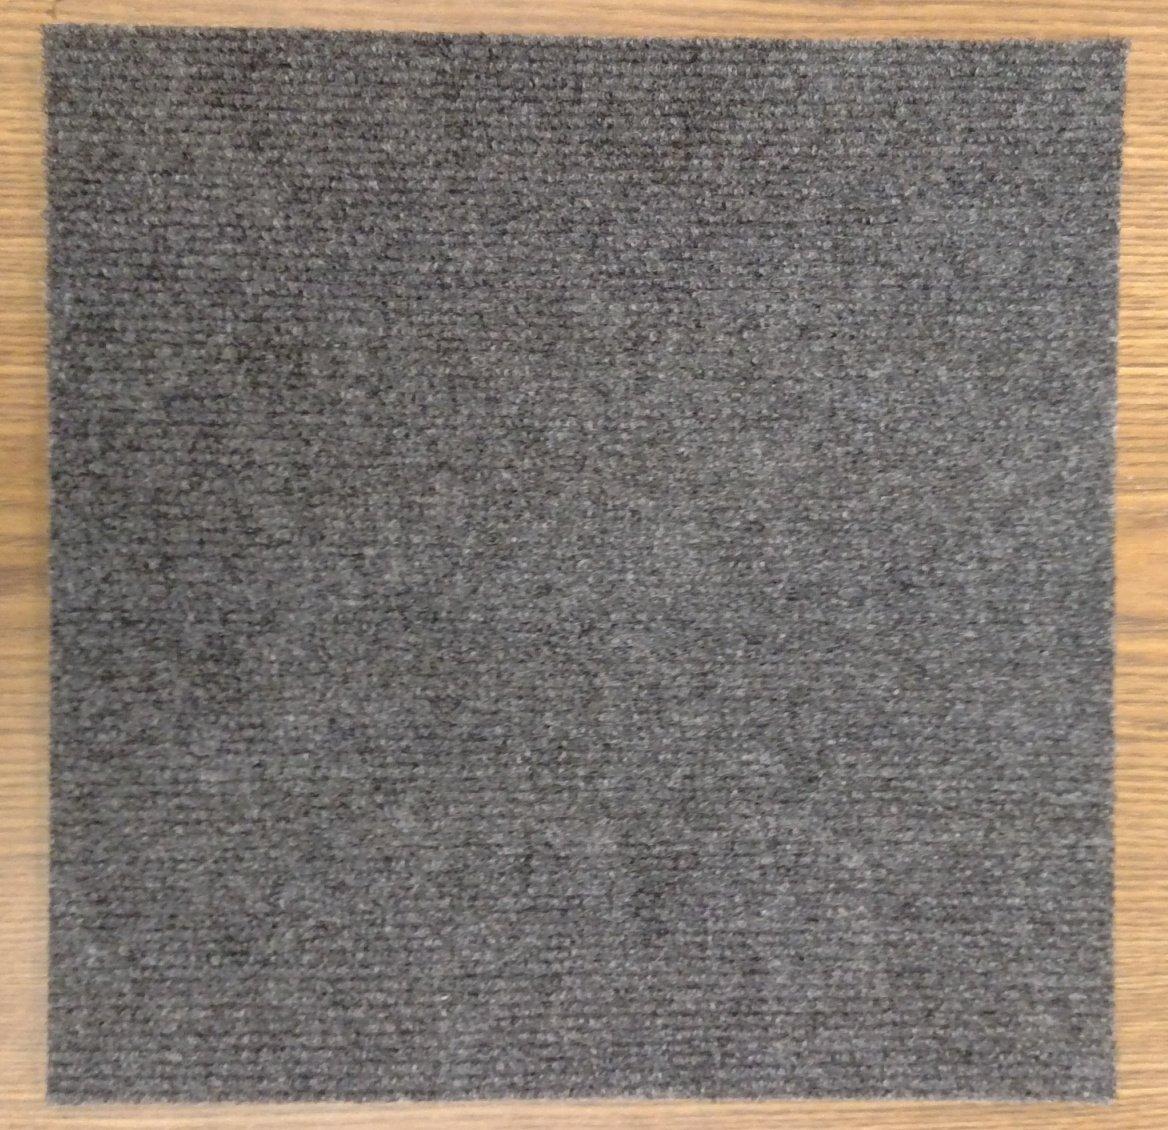 Carpet Tiles Self Stick 12'' (144 Sq. Ft.) Charcoal Gray